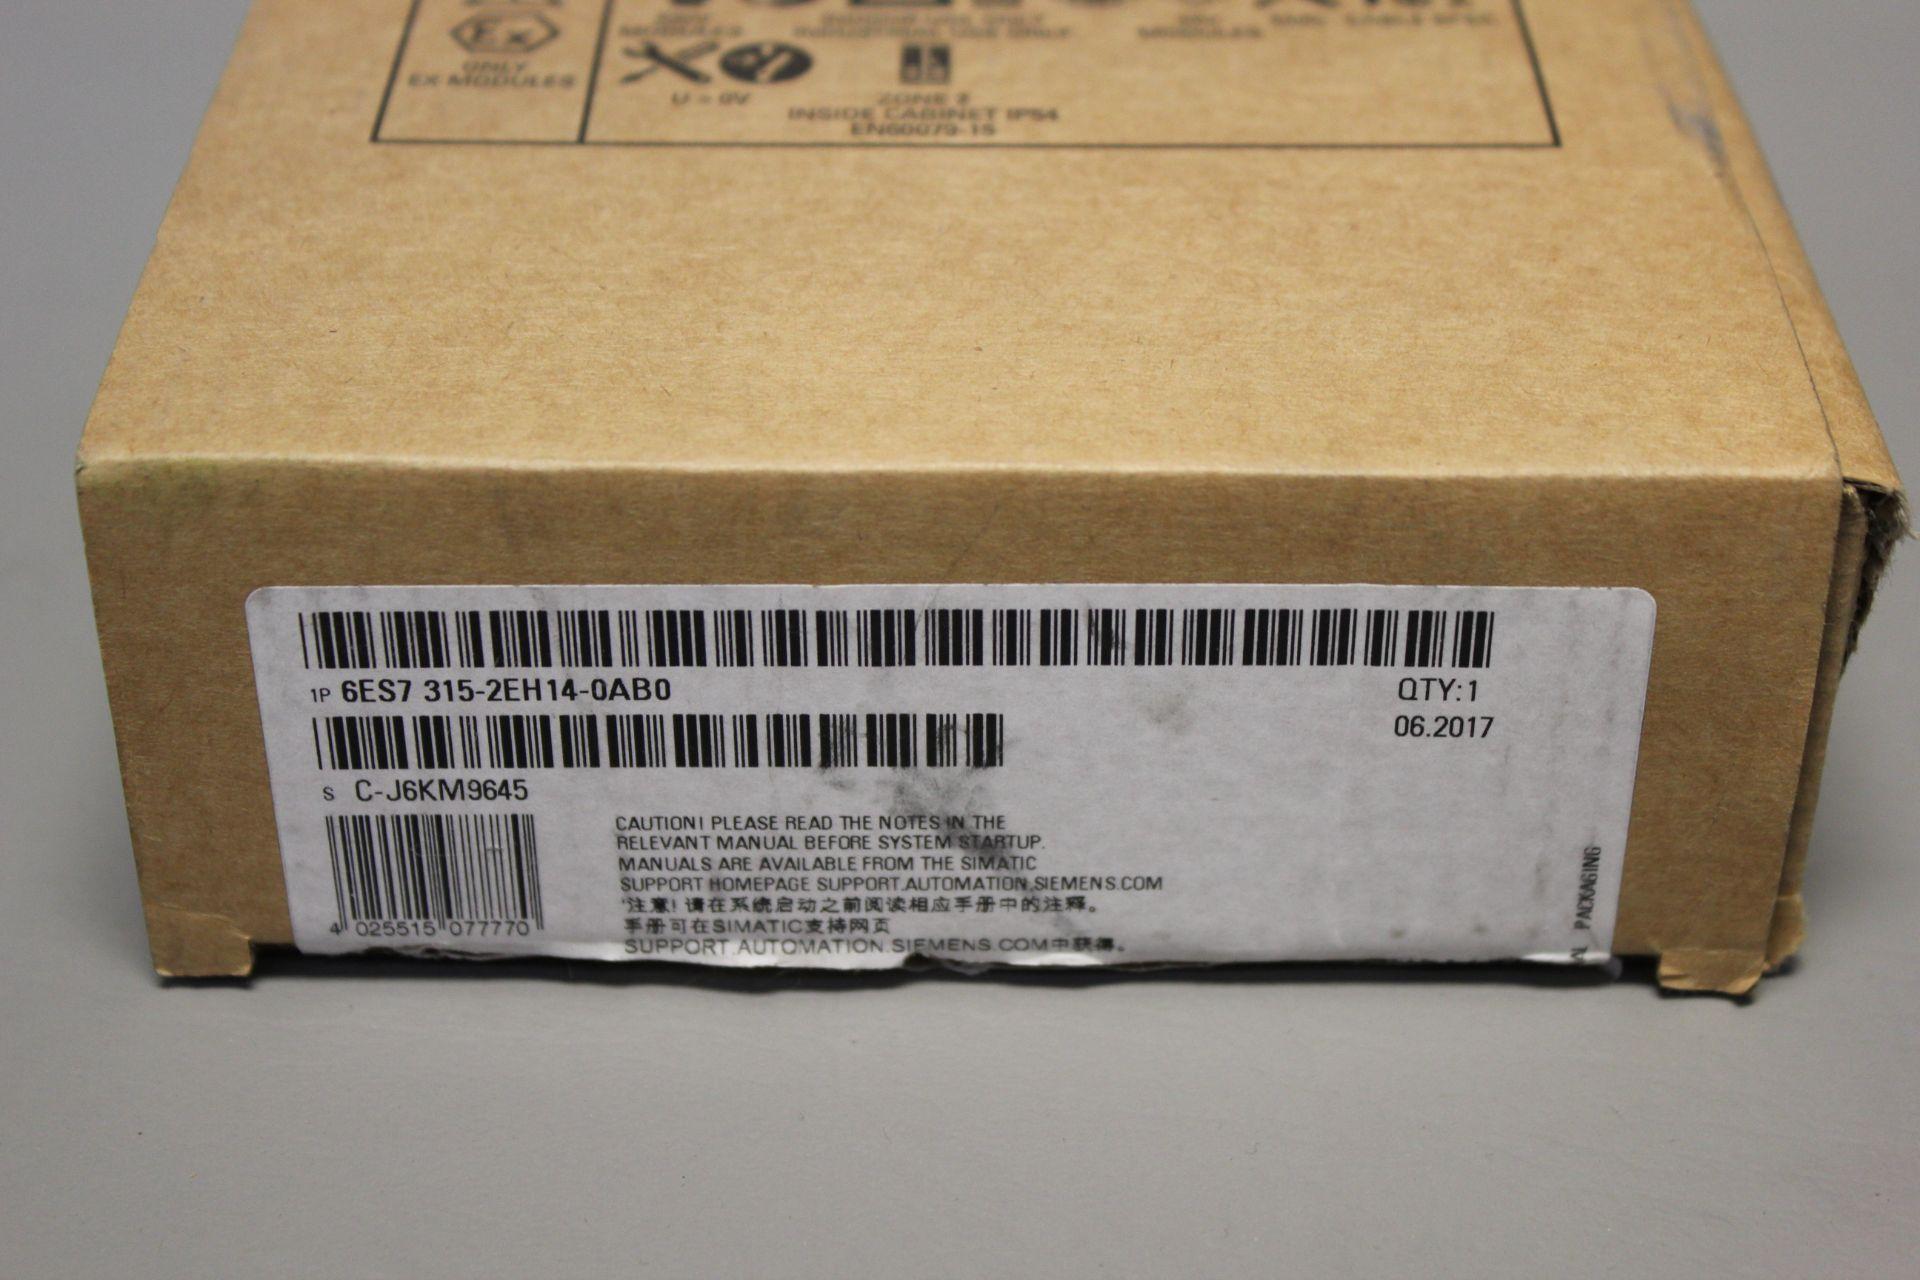 NEW SIEMENS SIMATIC S7-300 PLC CPU PROCESSOR - Image 2 of 7